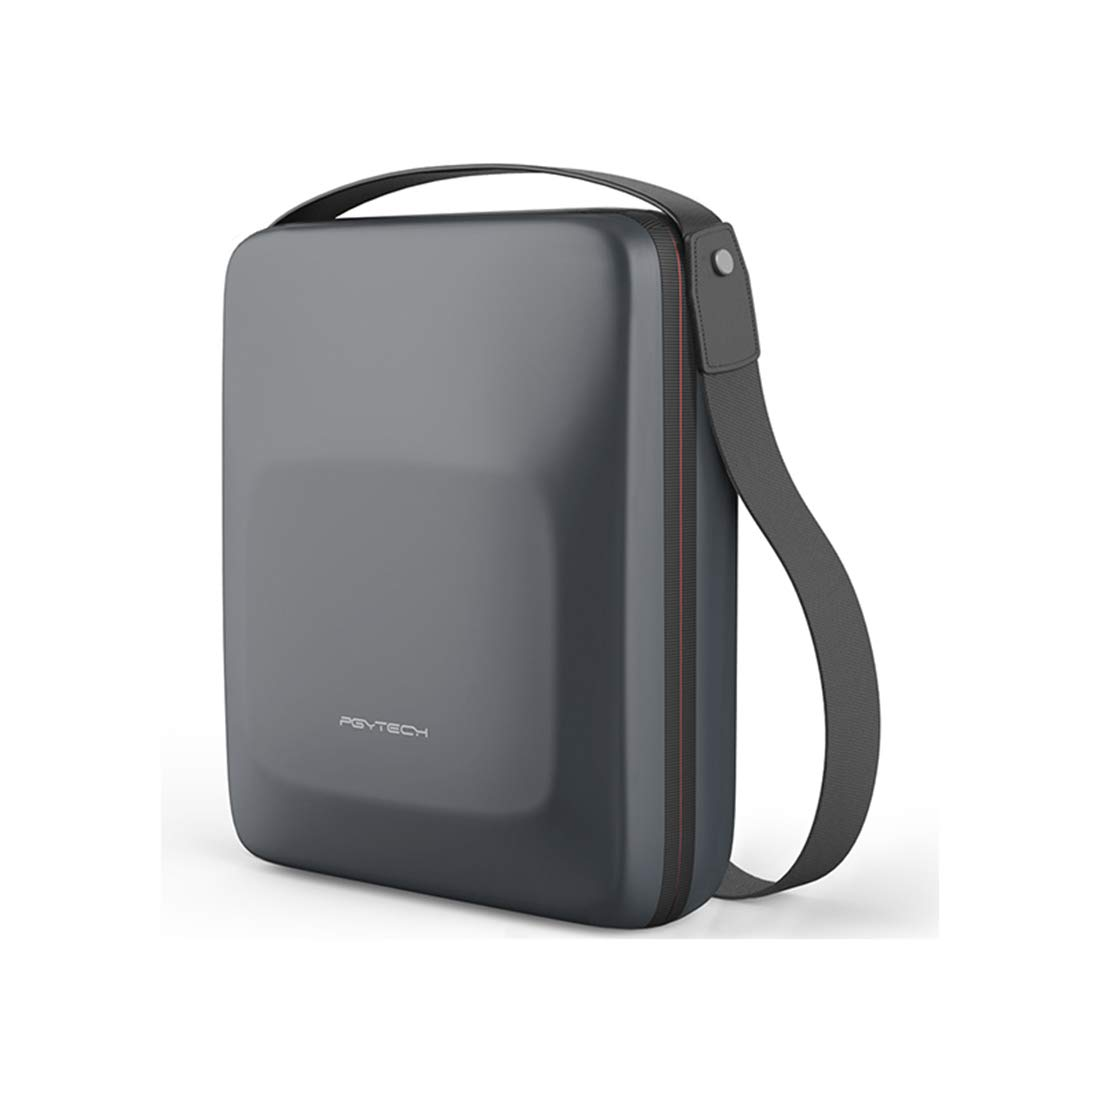 PGYTECH Petforu Carrying Case Single-Shoulder Bag Handbag for DJI Mavic 2 PRO /Mavic 2 Zoom